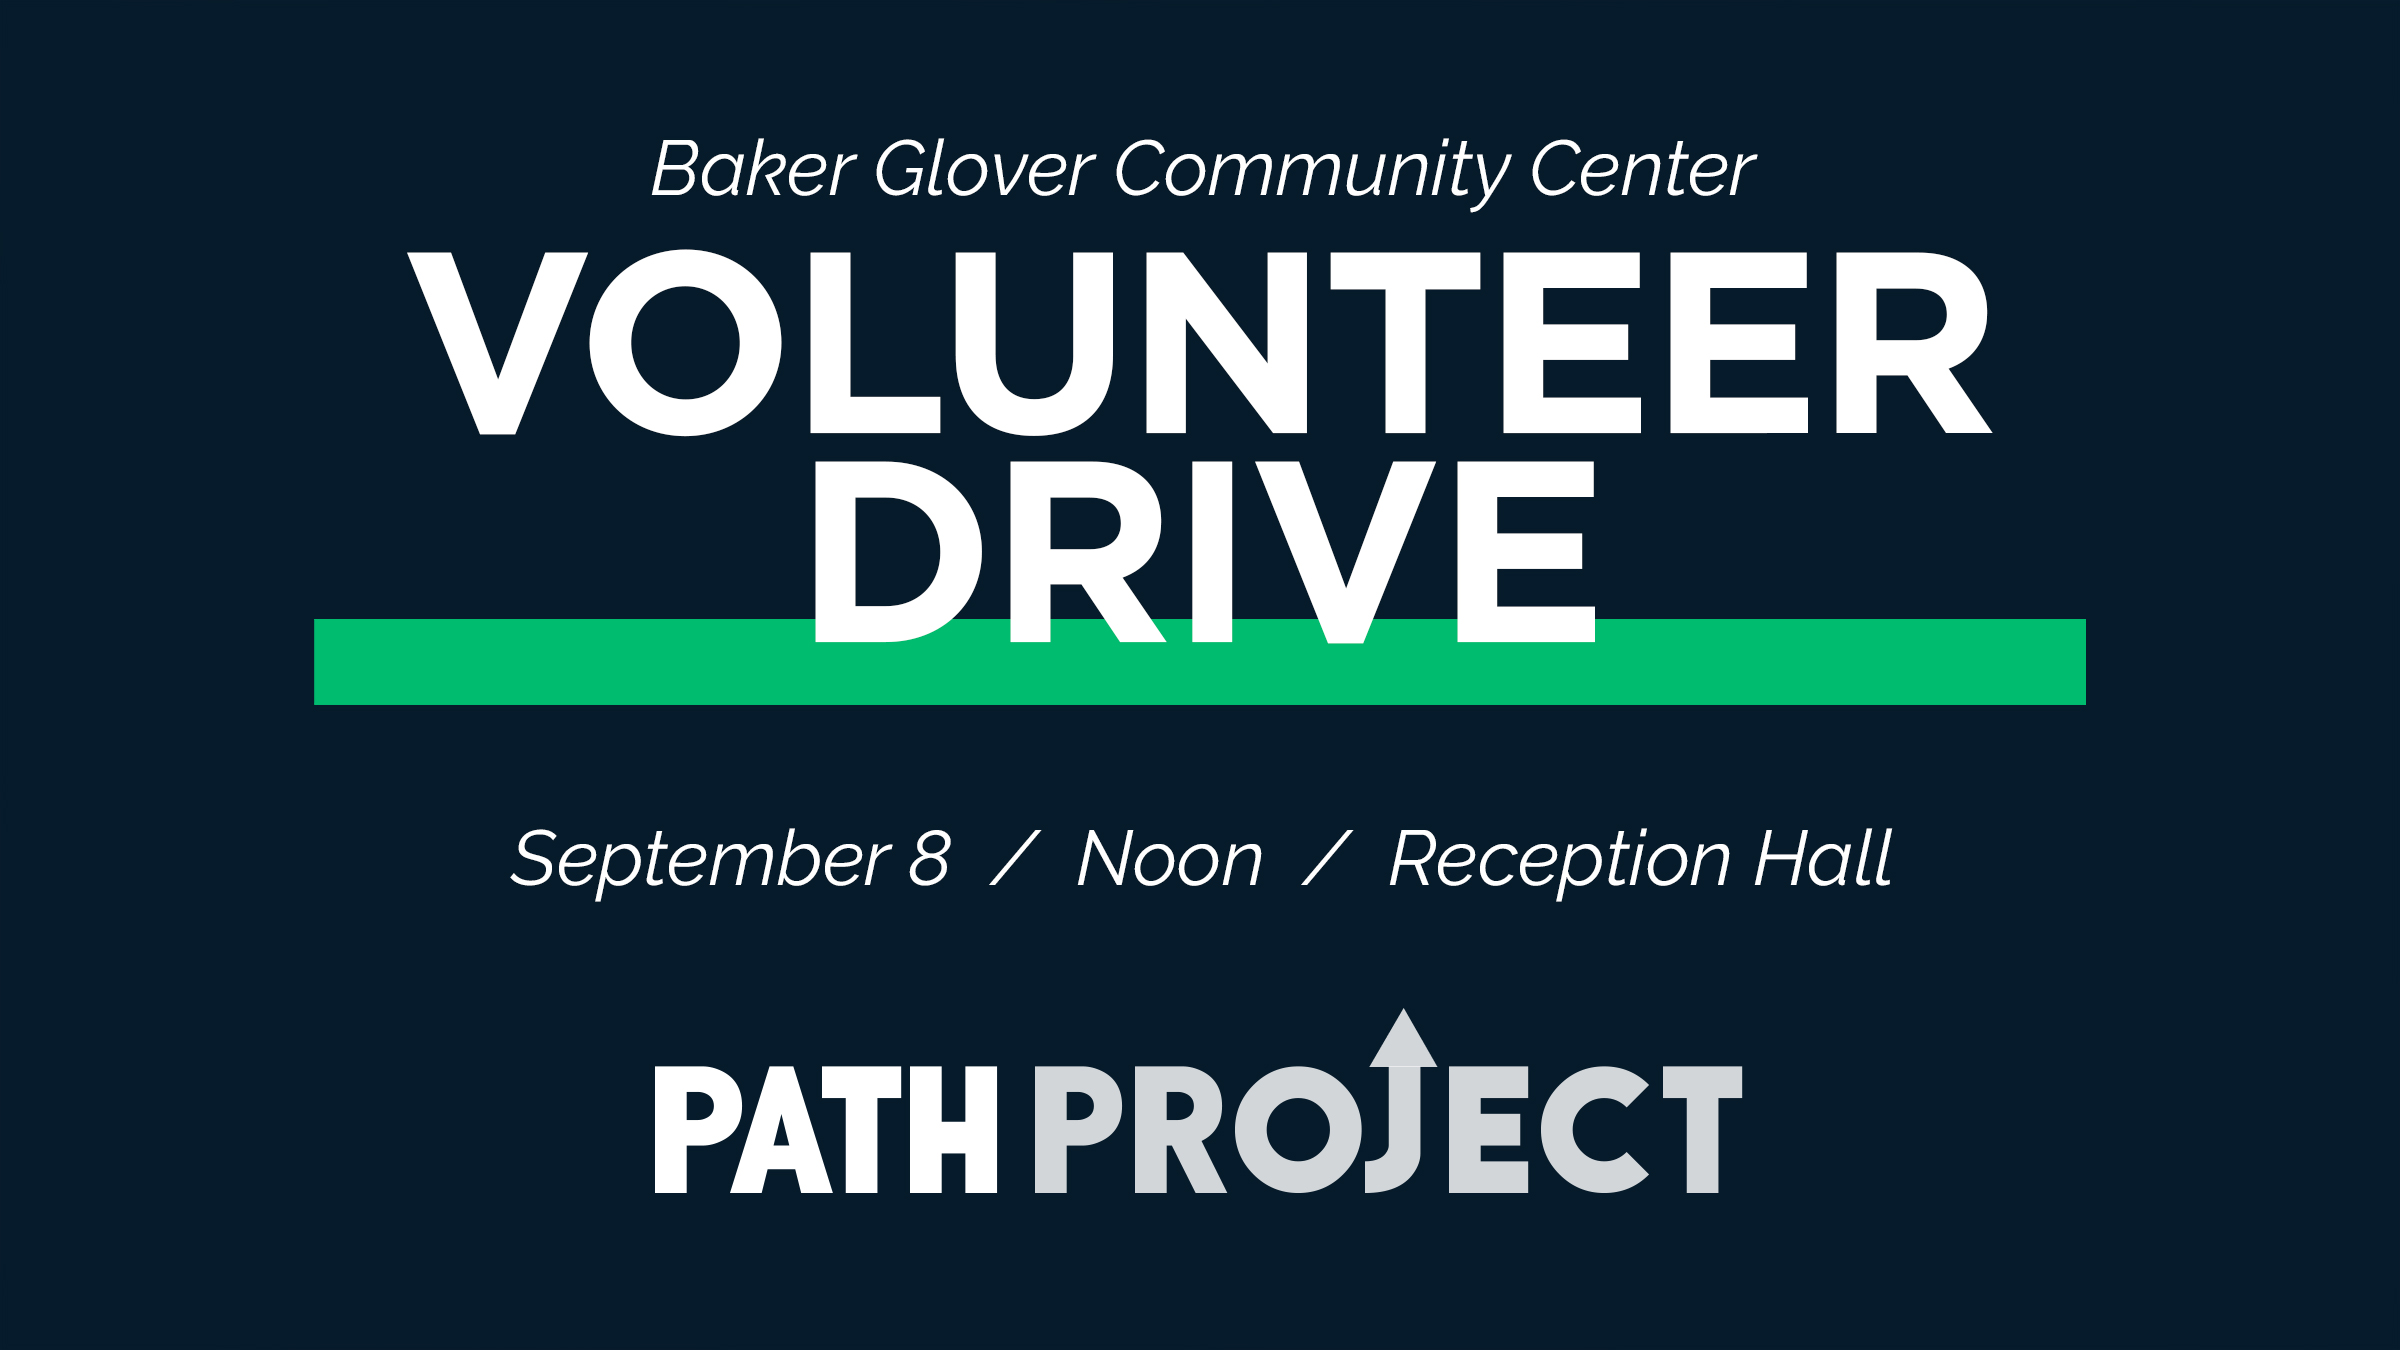 screen_baker_glover_volunteer_drive_2019.jpg